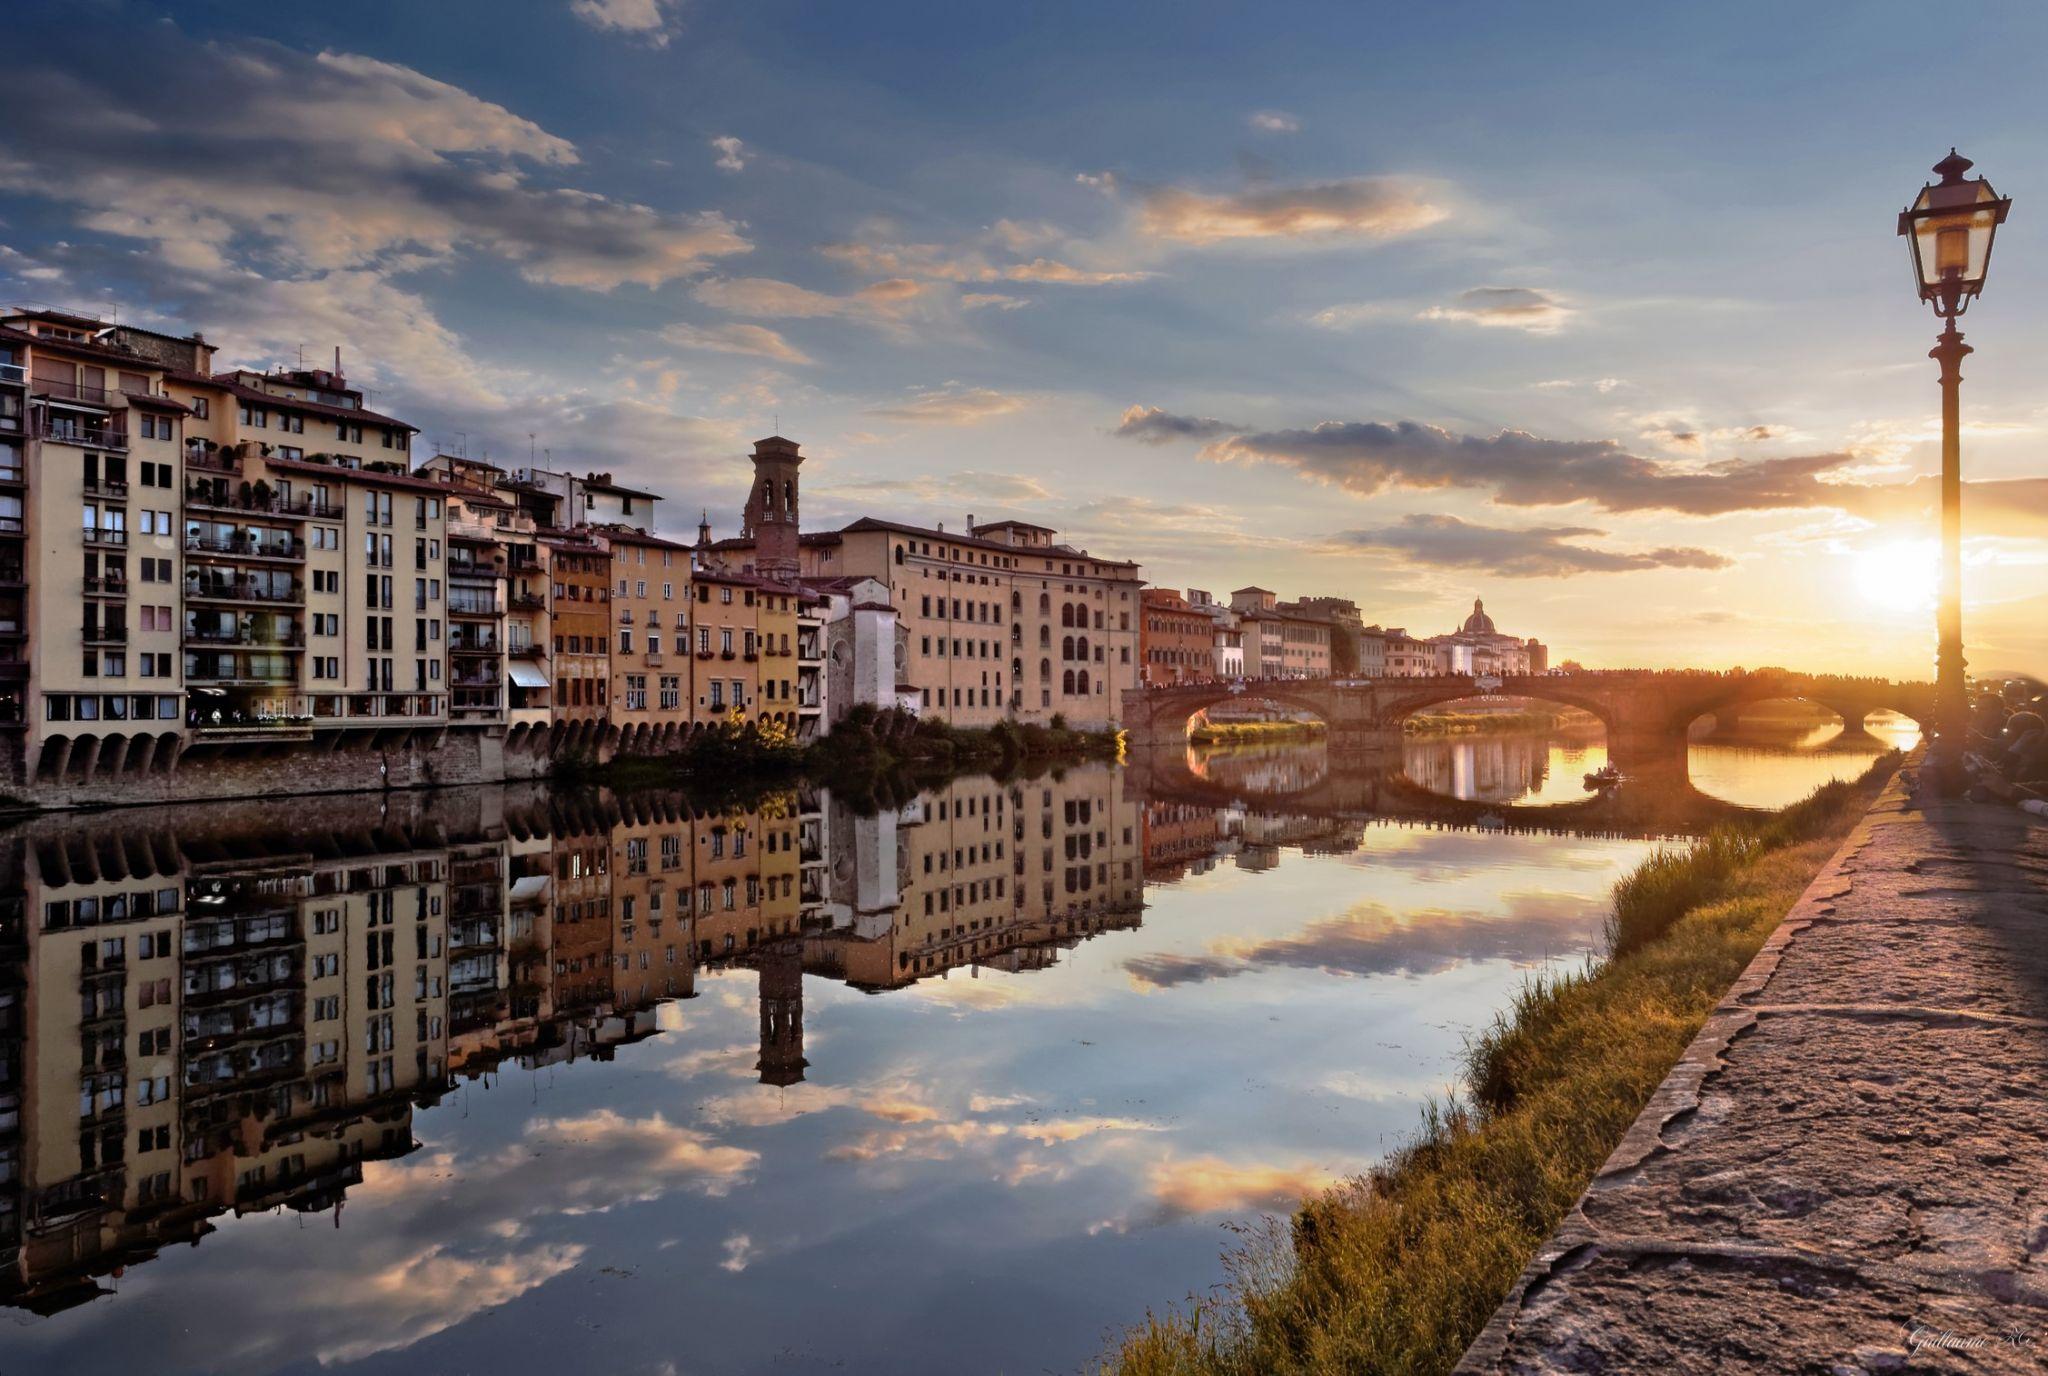 Firenze (Arno), Italy